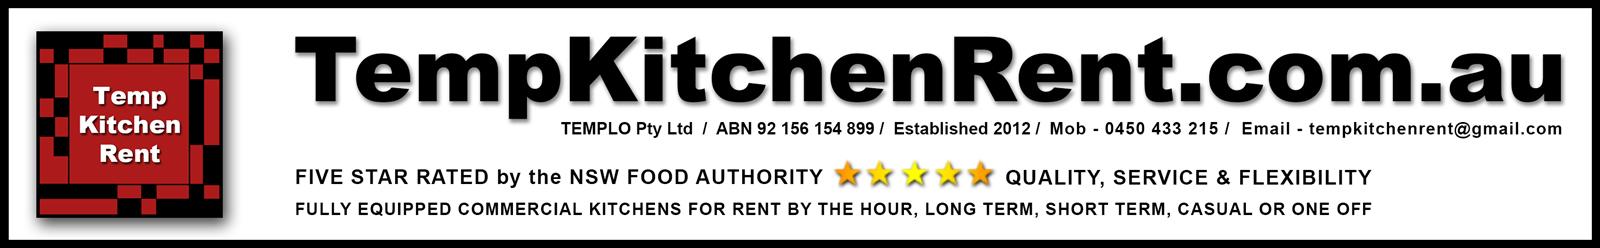 Temp Kitchen Rent By The Hour Tempkitchenrent